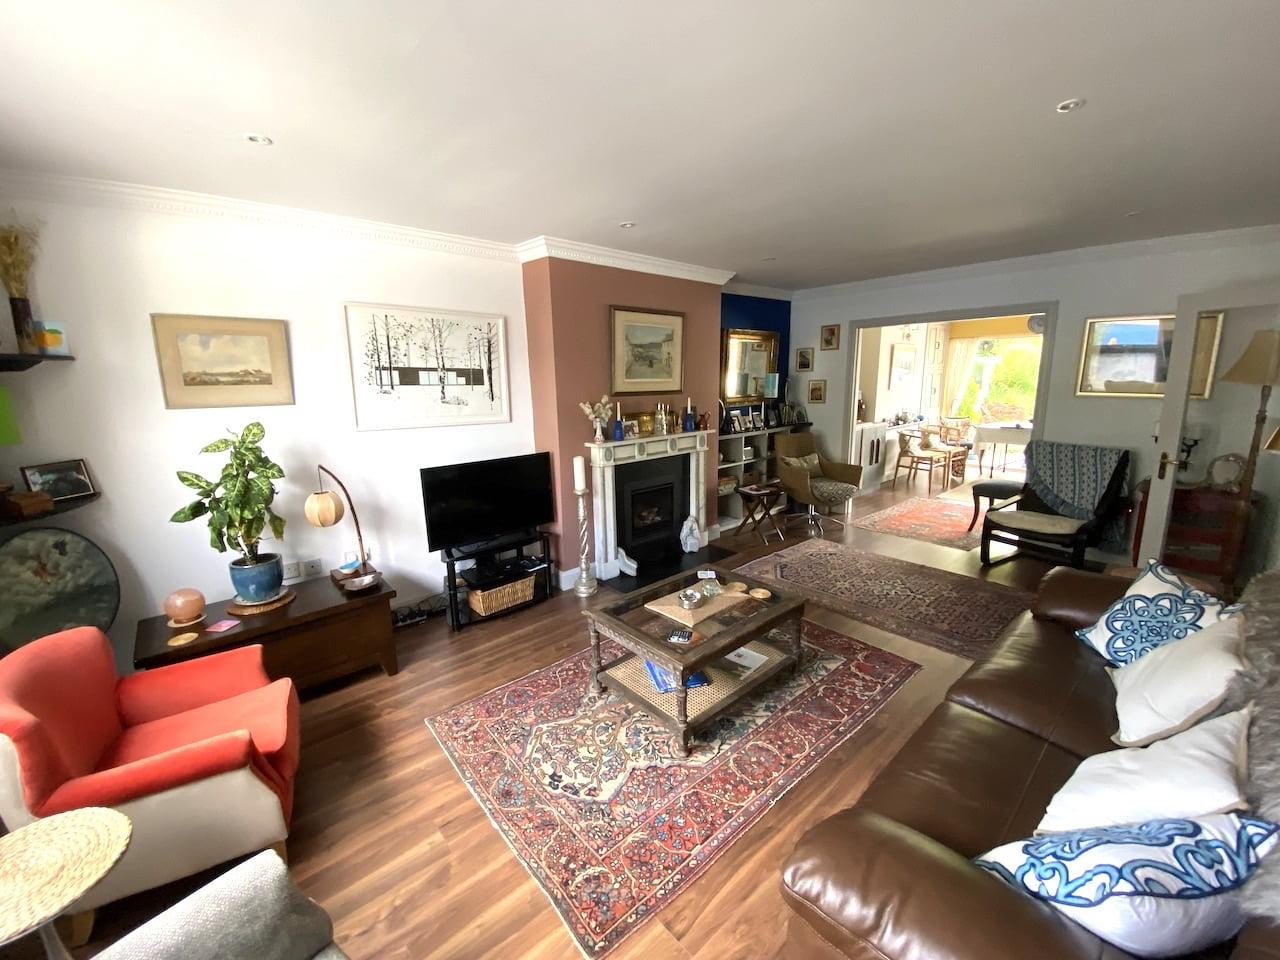 SOLD – Foxrock Village Spacious Modern 4 Bedroom Home – FOR SALE